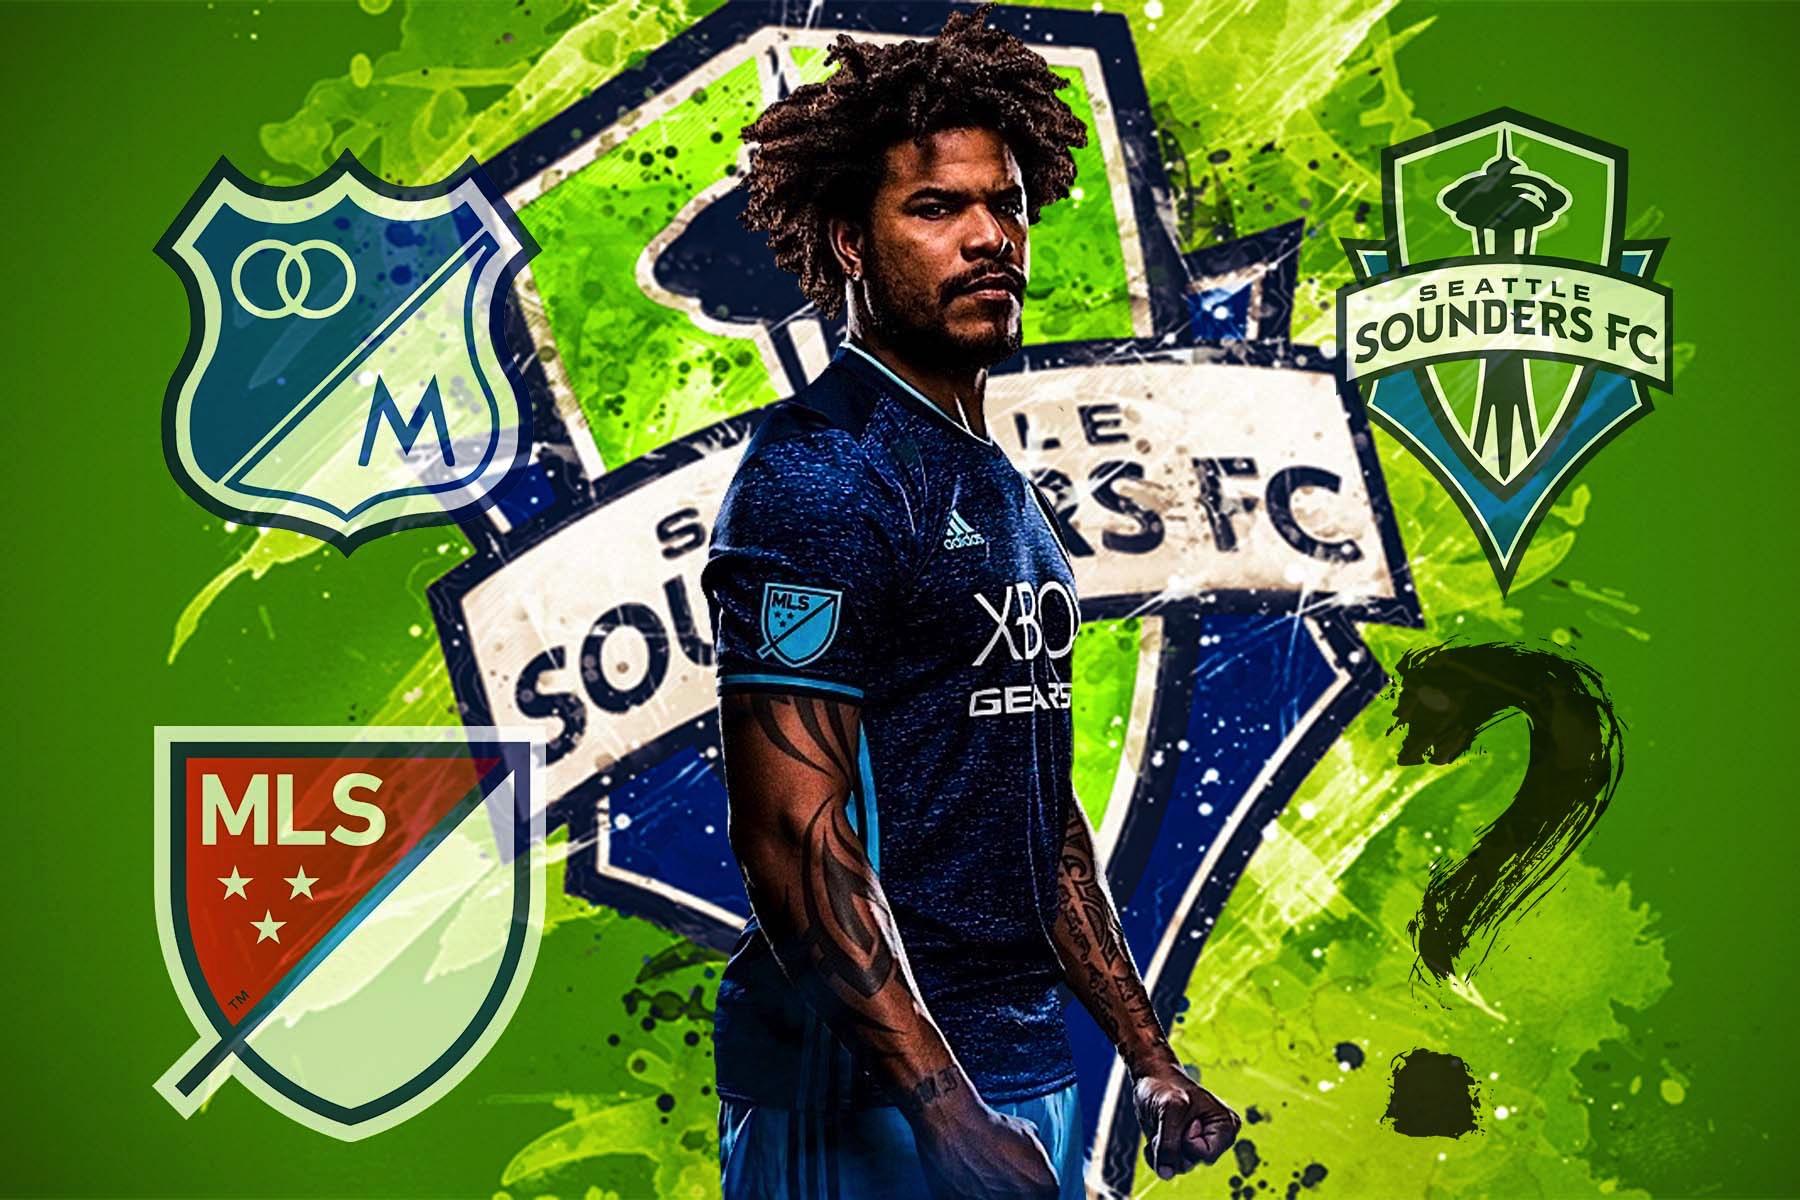 MLS Sounders